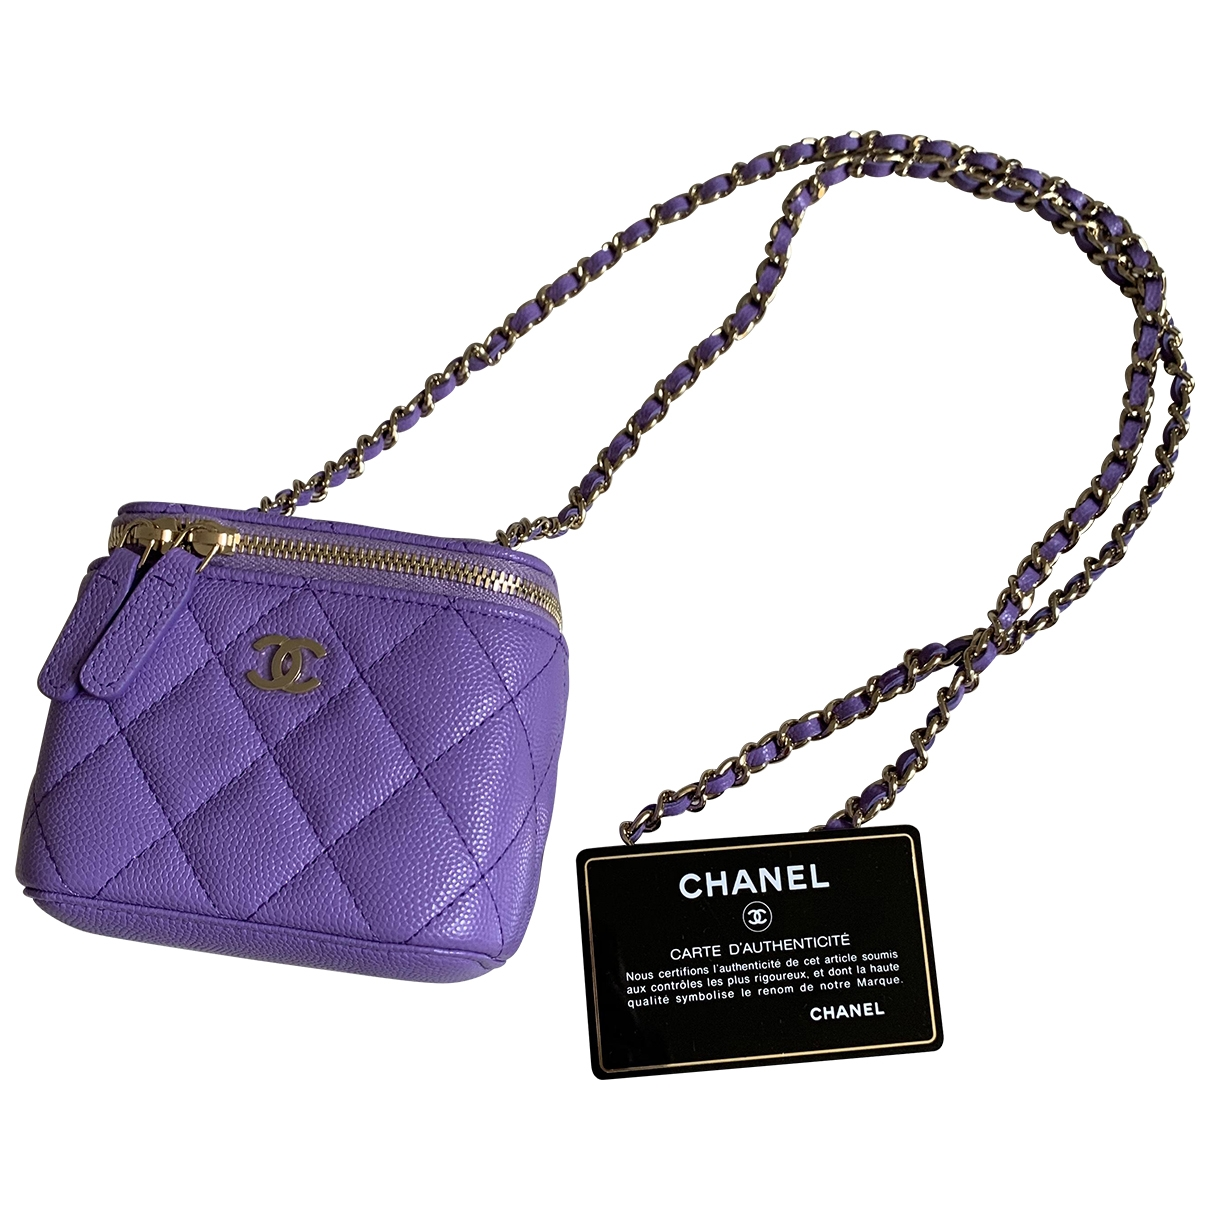 Chanel \N Purple Leather handbag for Women \N